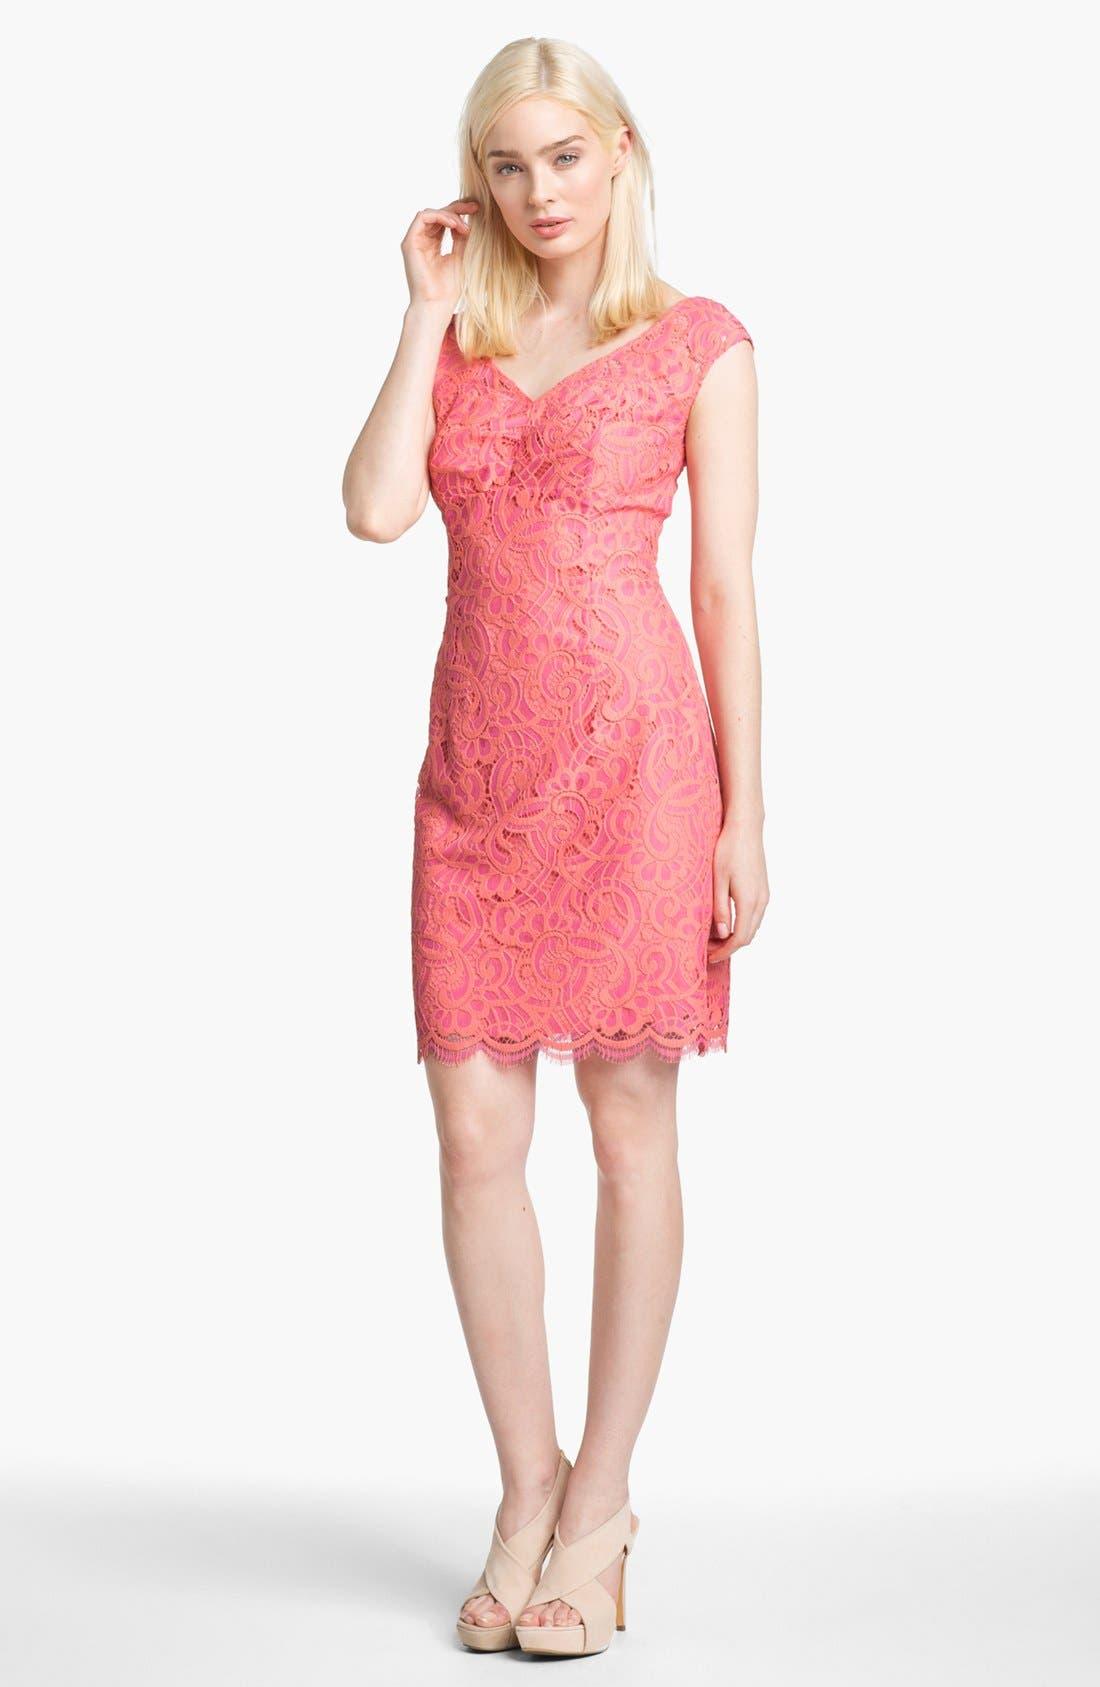 Alternate Image 1 Selected - Lilly Pulitzer® 'Rosaline' Lace Sheath Dress